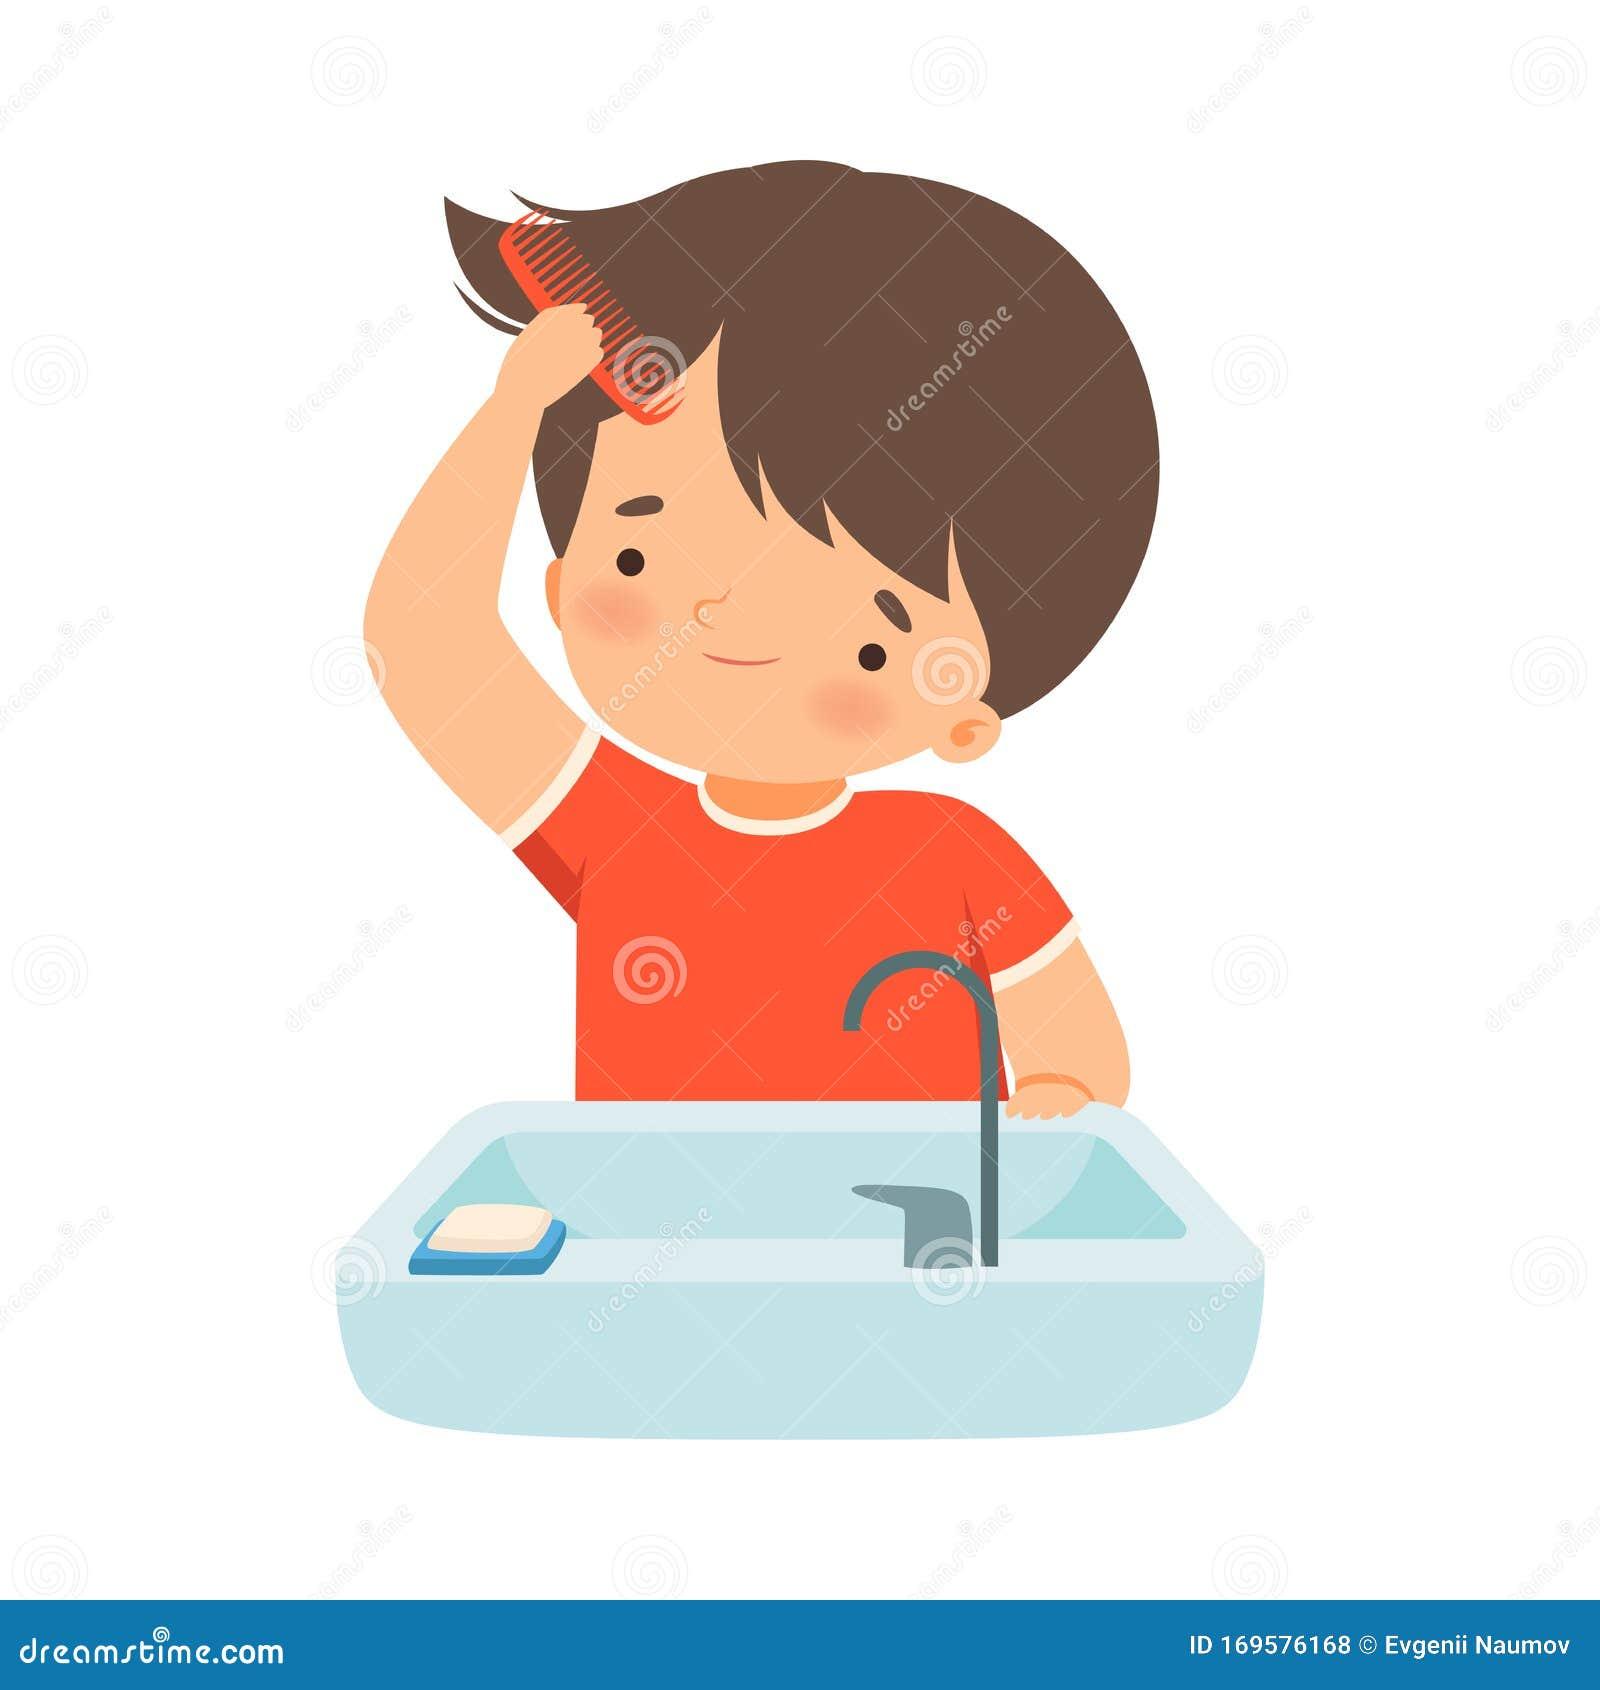 Boy Brushing Hair Stock Illustrations 81 Boy Brushing Hair Stock Illustrations Vectors Clipart Dreamstime